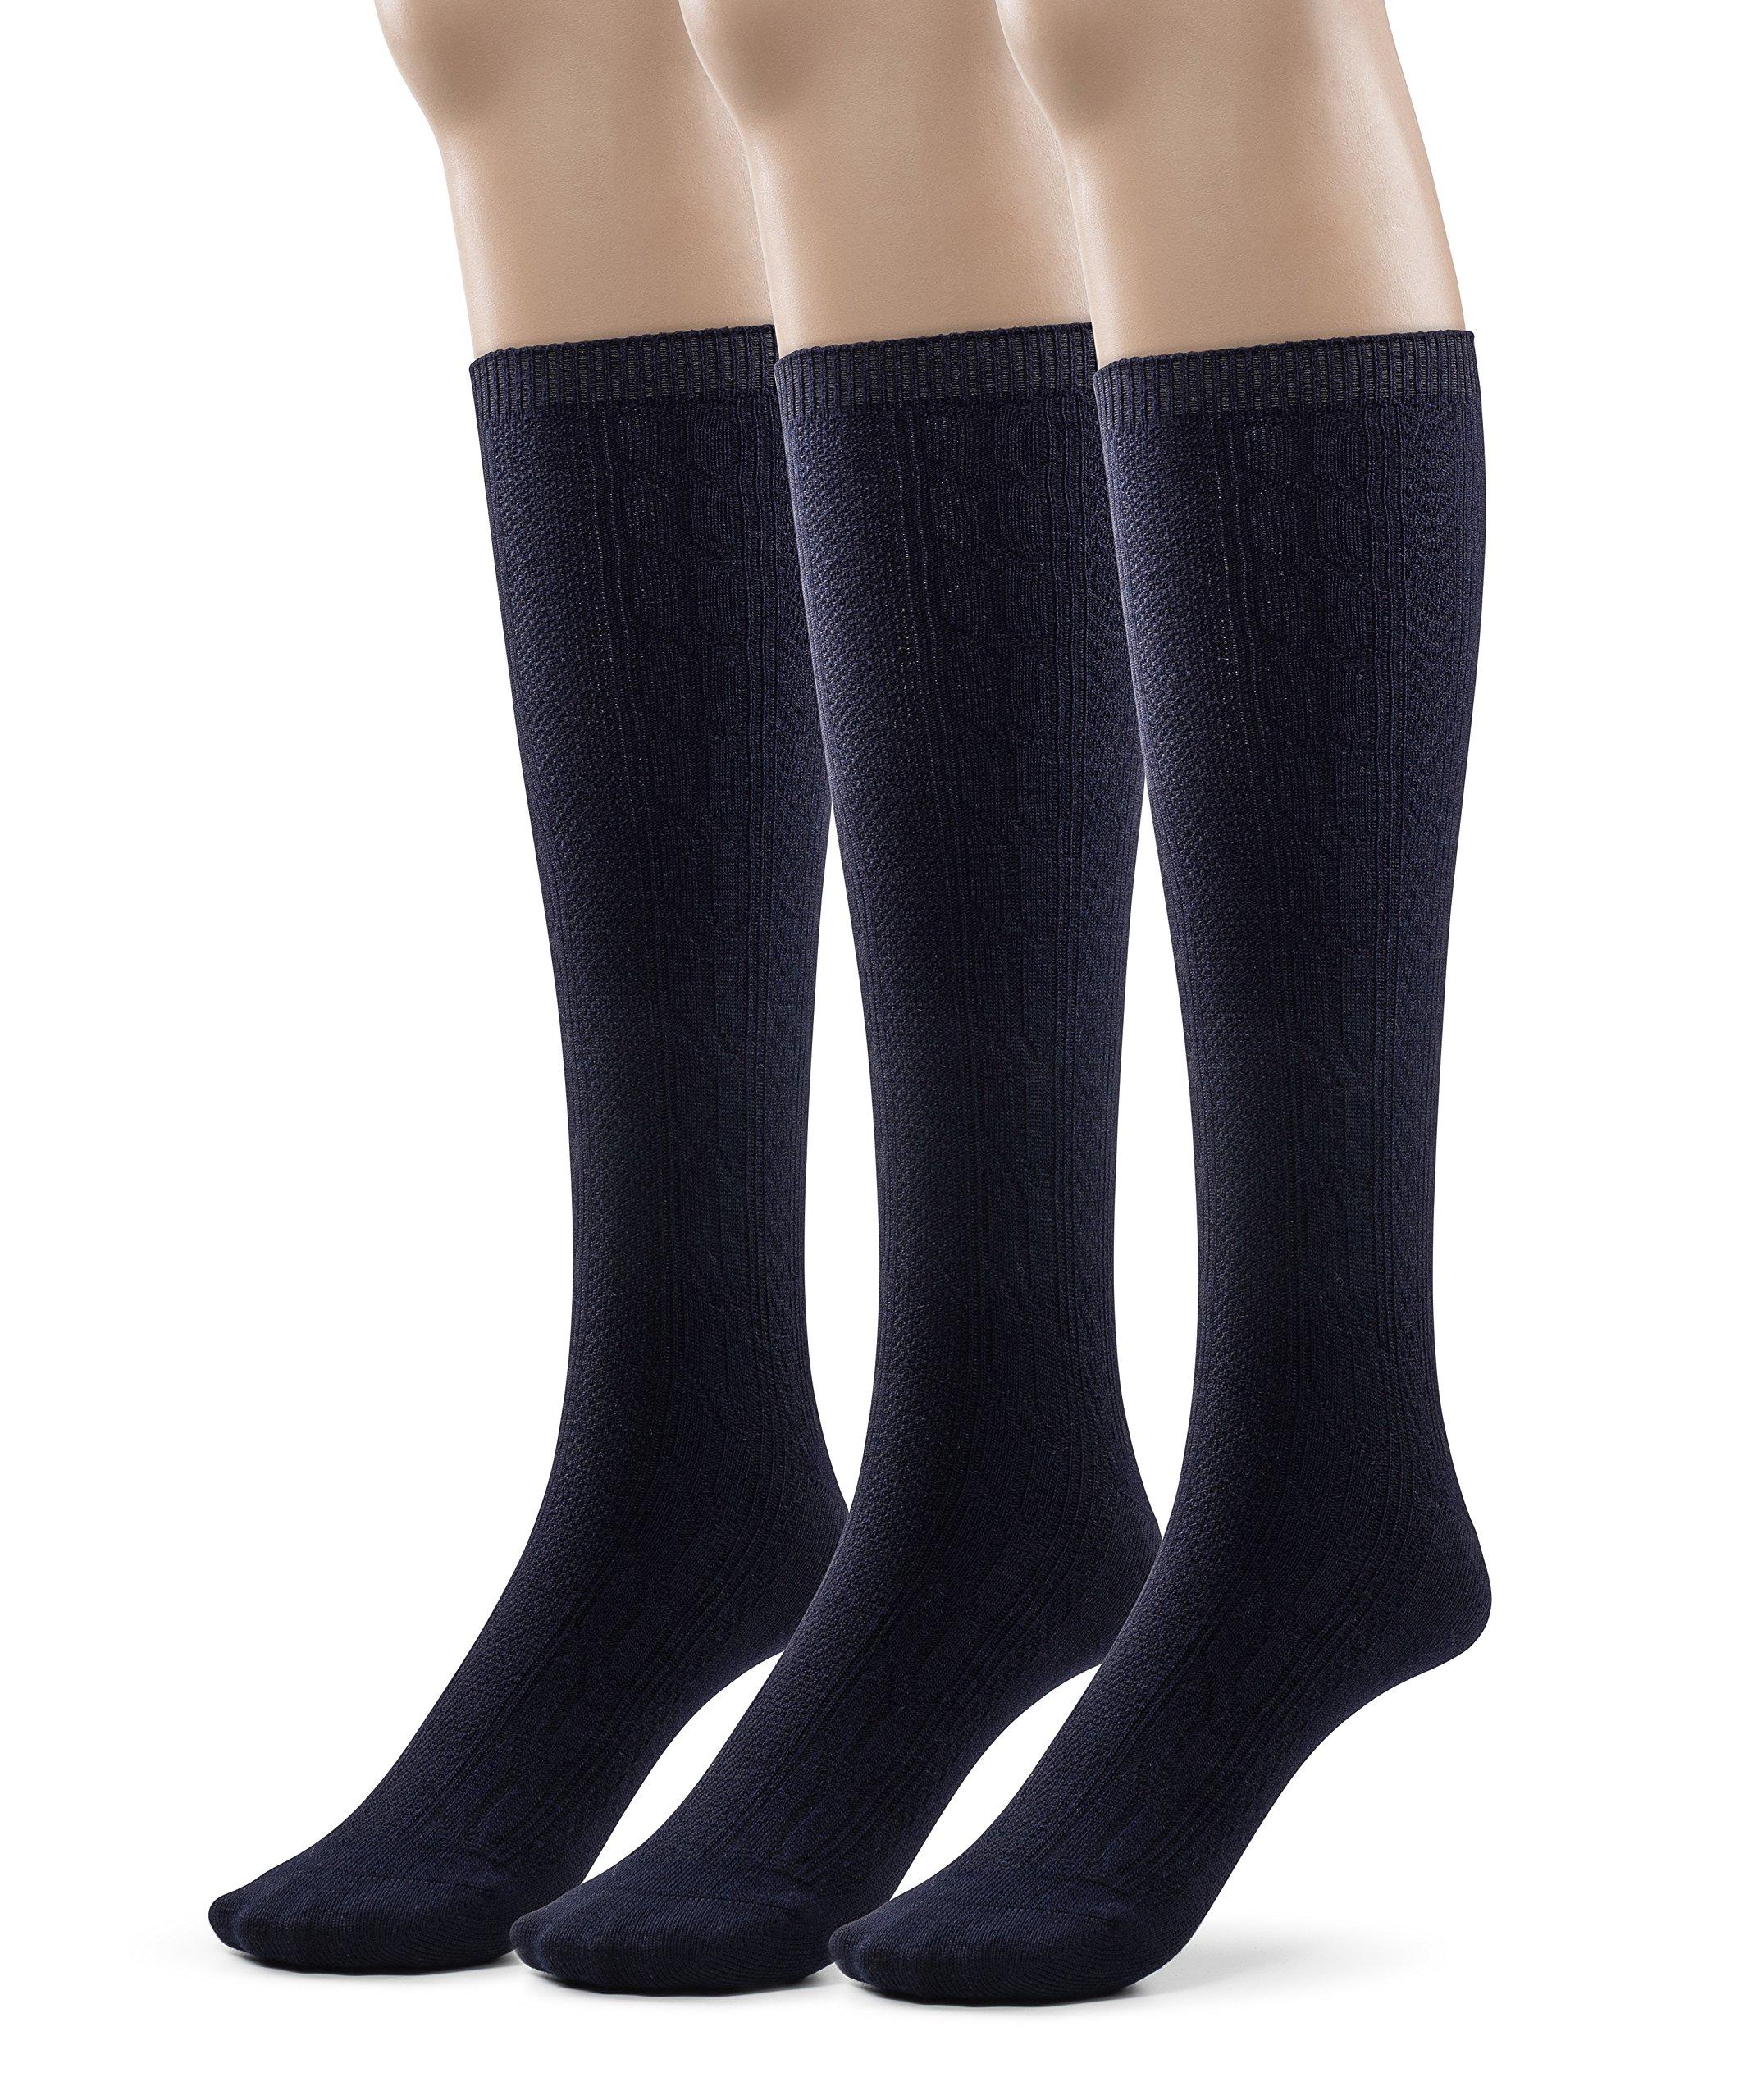 Girls Bamboo Casual Knee High Socks, School Uniform Colors (Large (9-11), Navy)